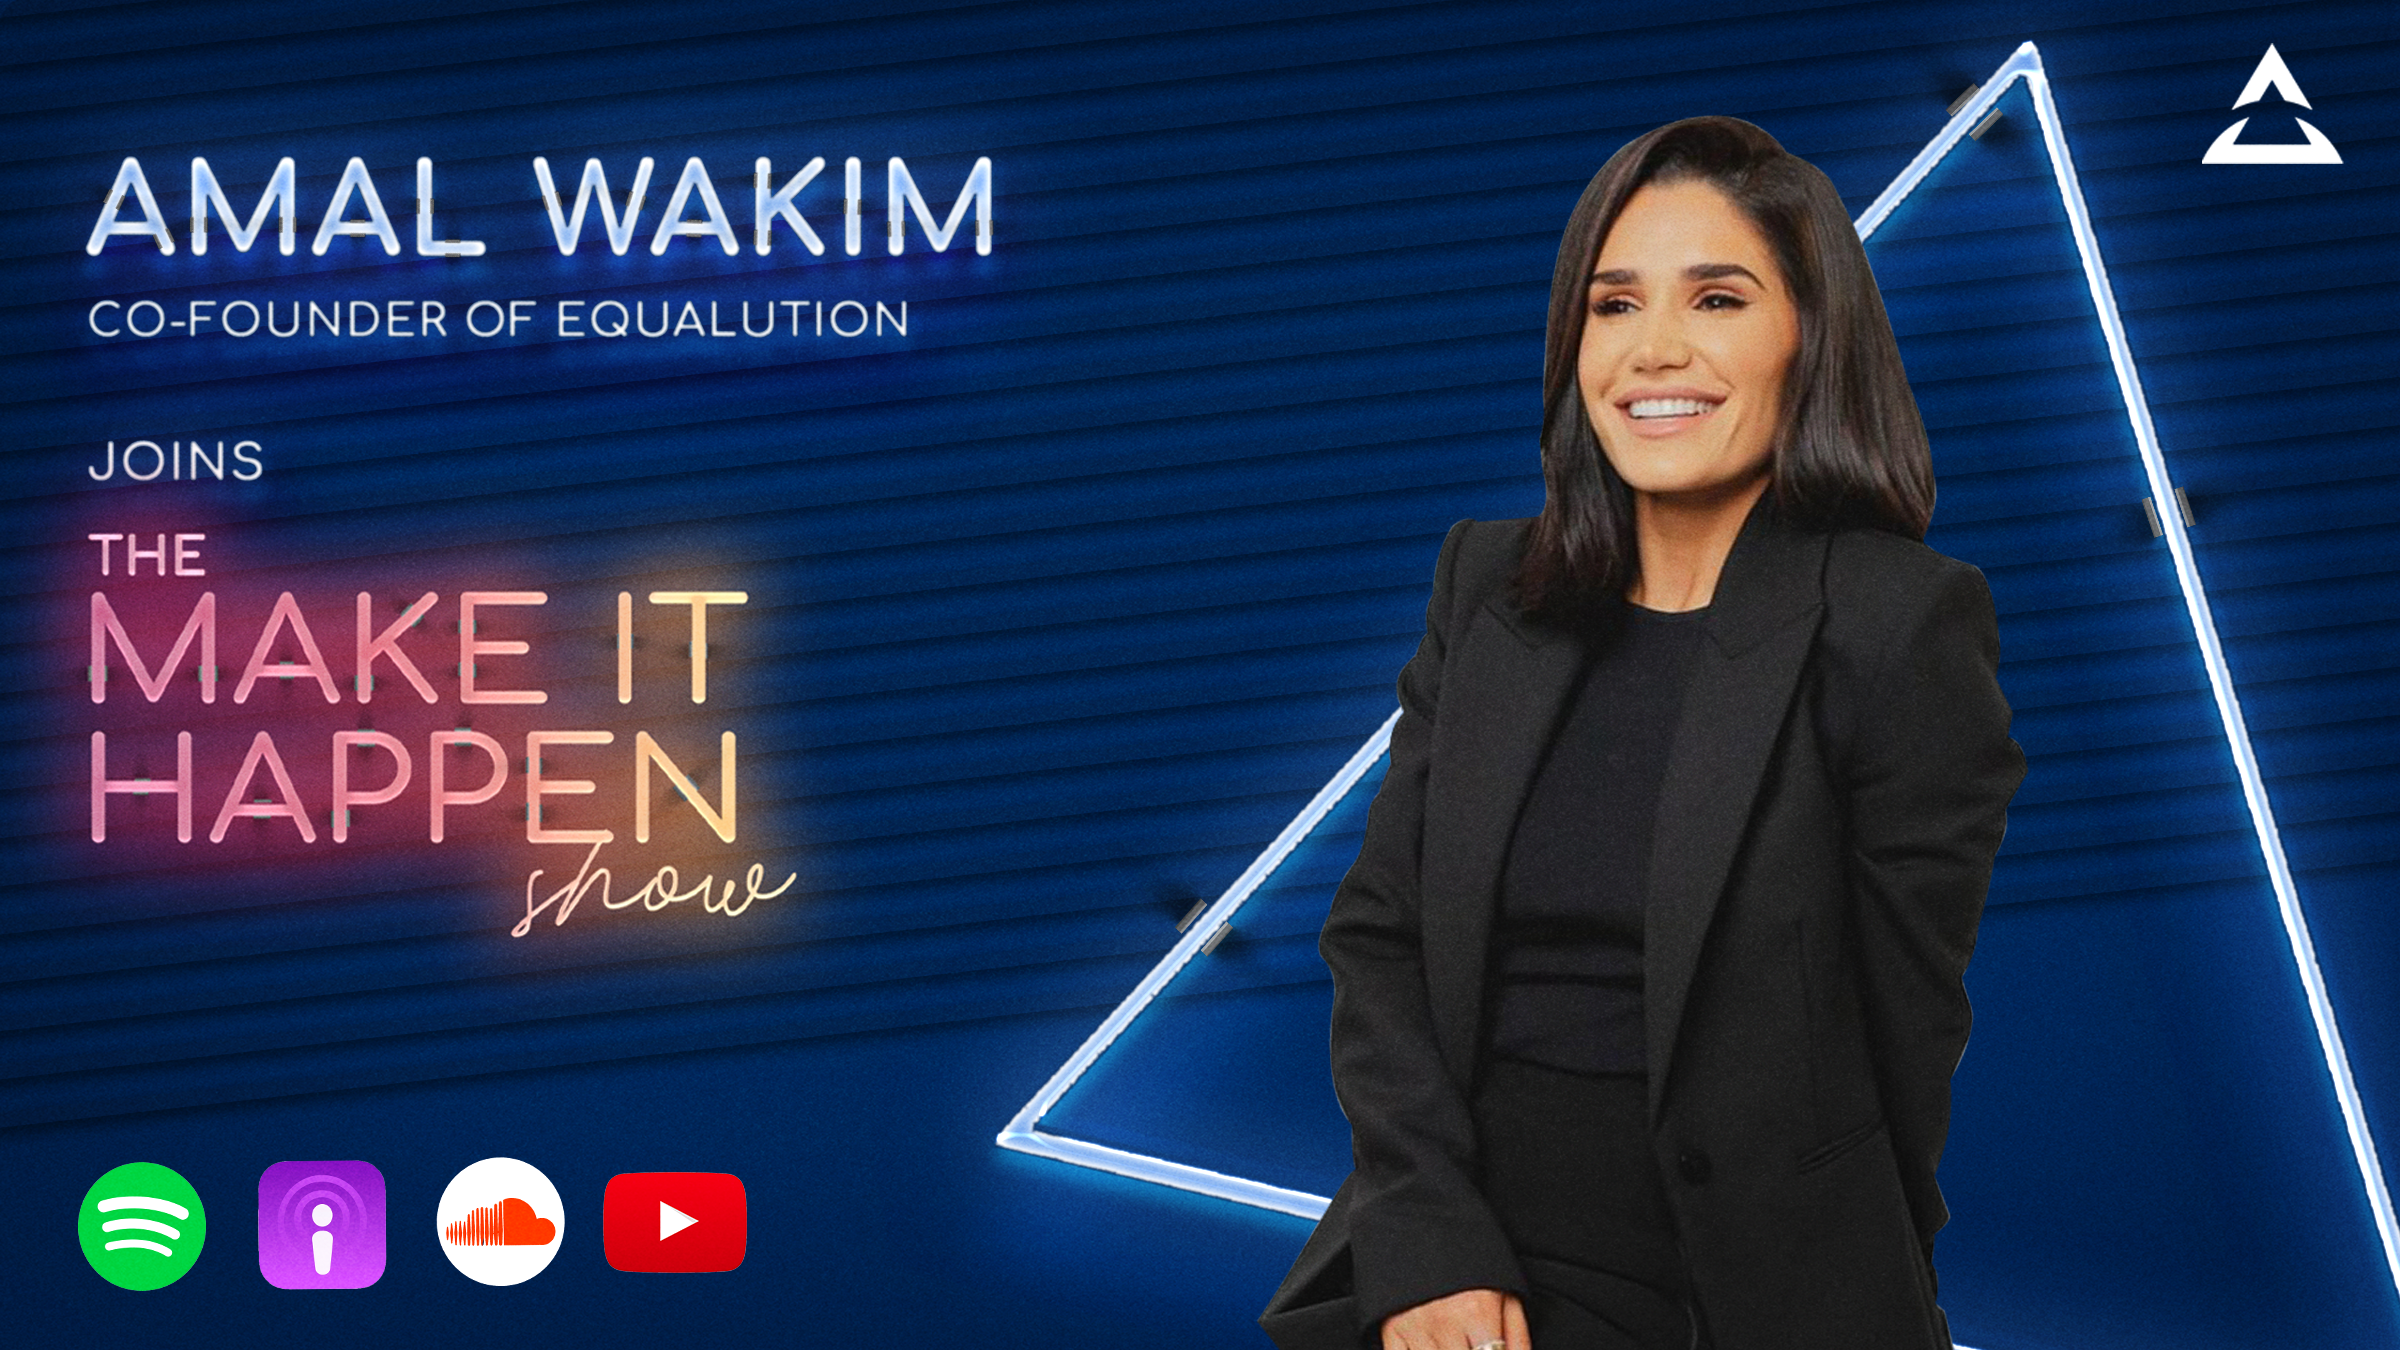 Amal Wakim joins The Make It Happen Show podcast